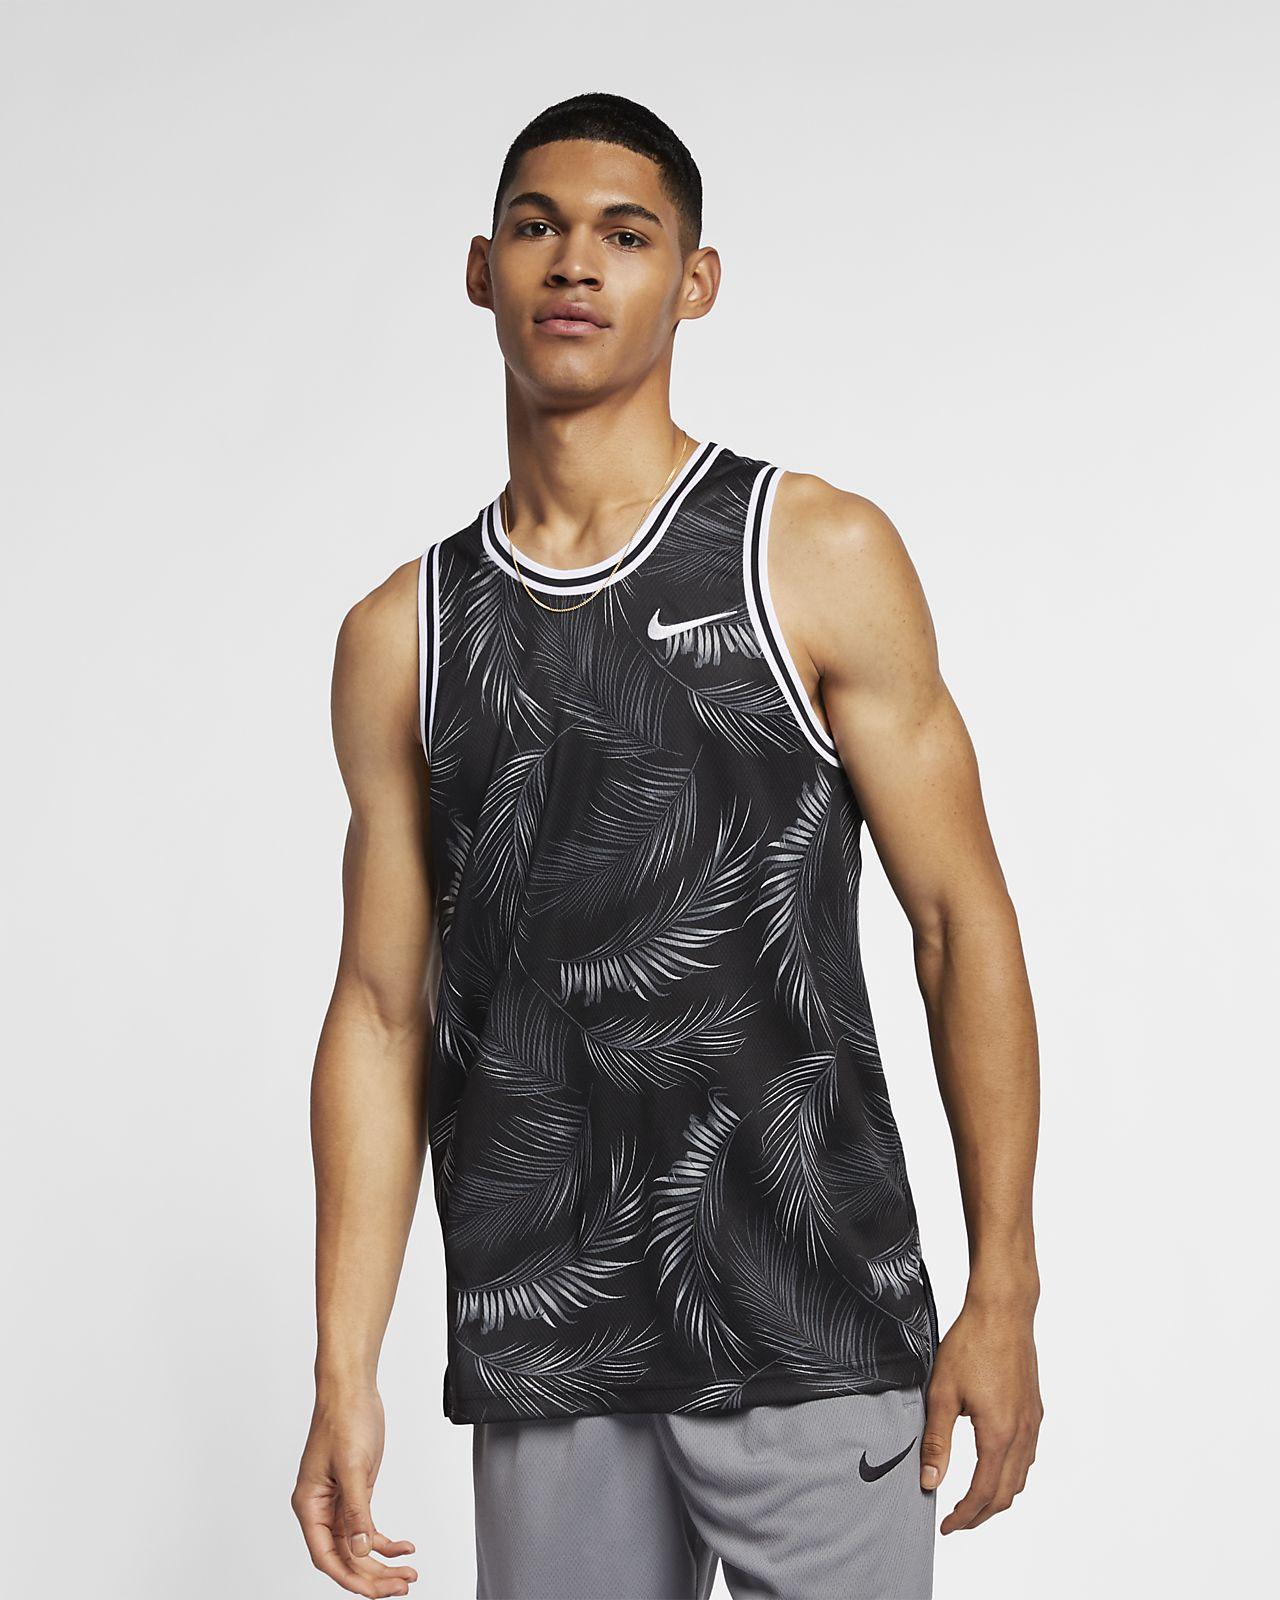 Nike Dri-FIT DNA Men's Printed Basketball Jersey